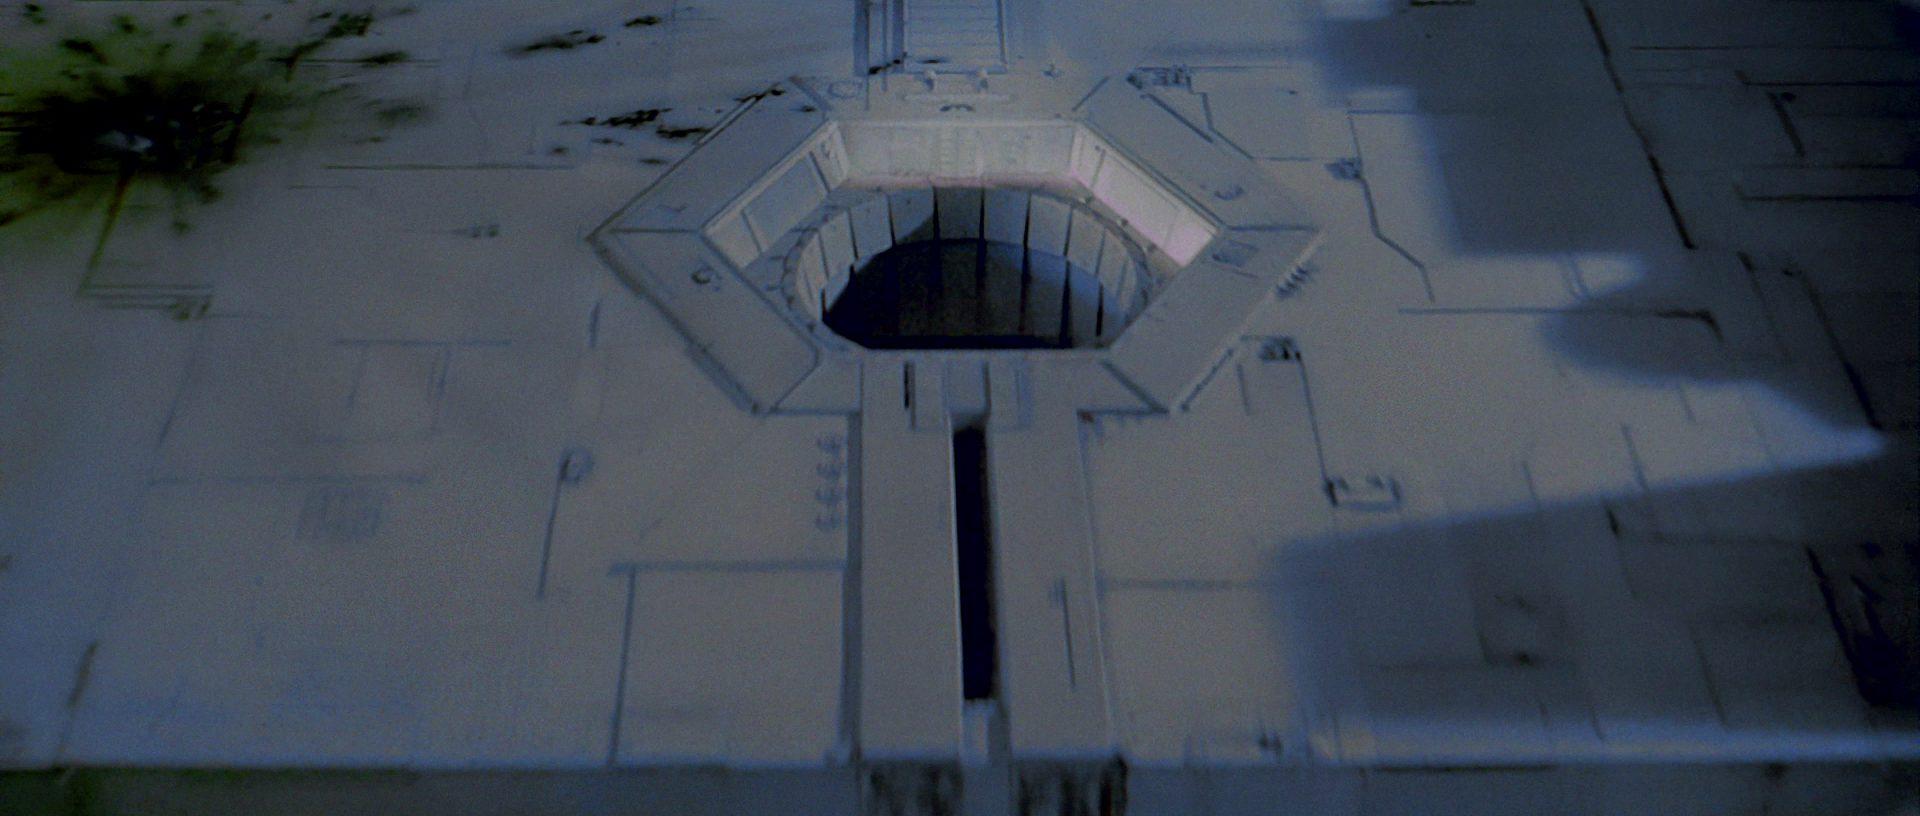 Star Wars plot holes - exhaust port